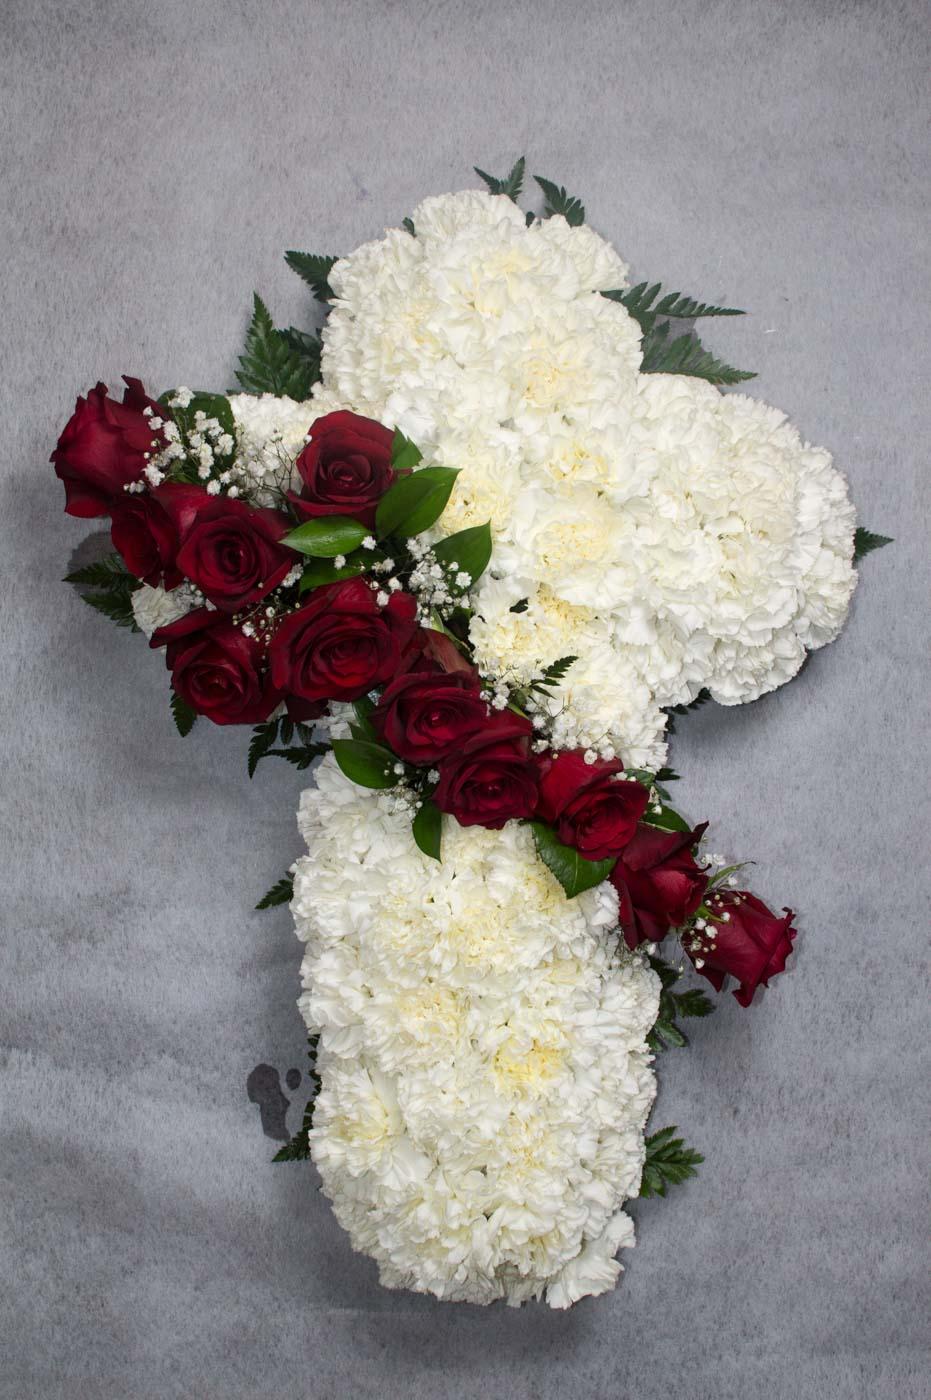 Cruz de flores - Funeraria La Paz Verín